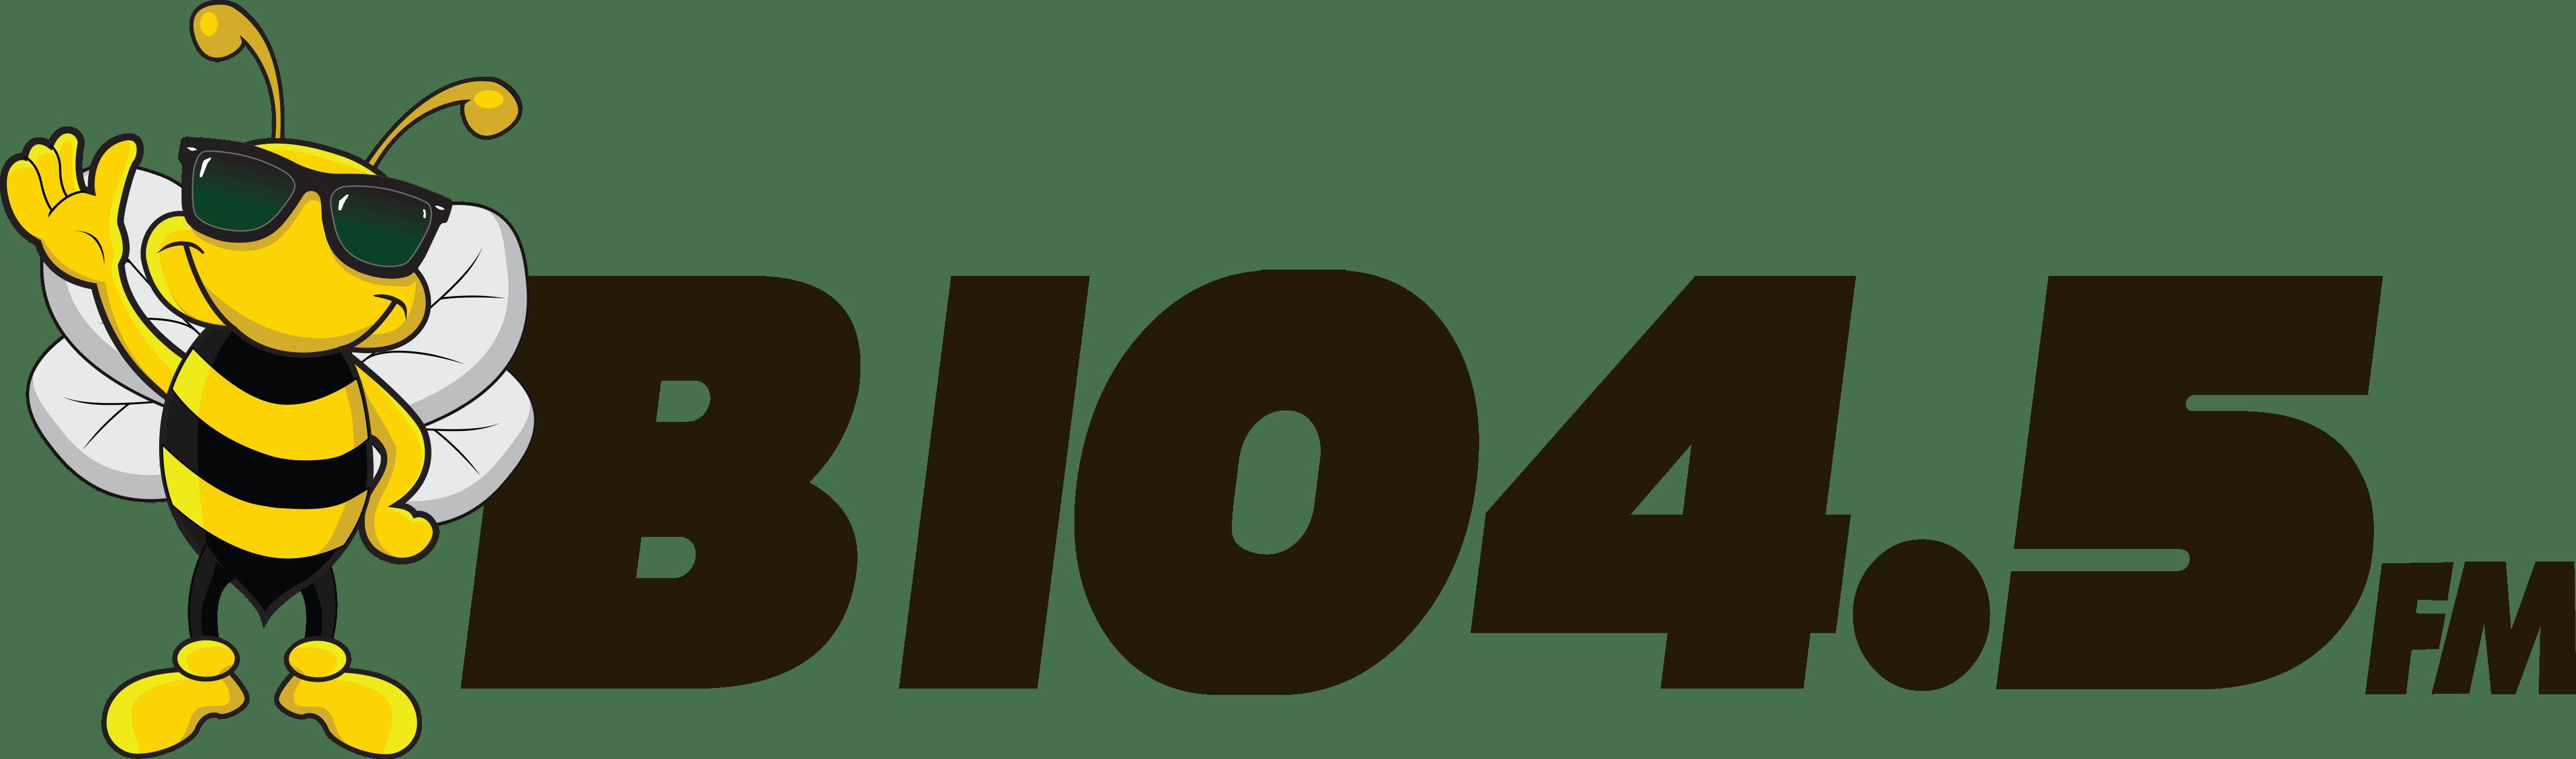 B1045-LOGO